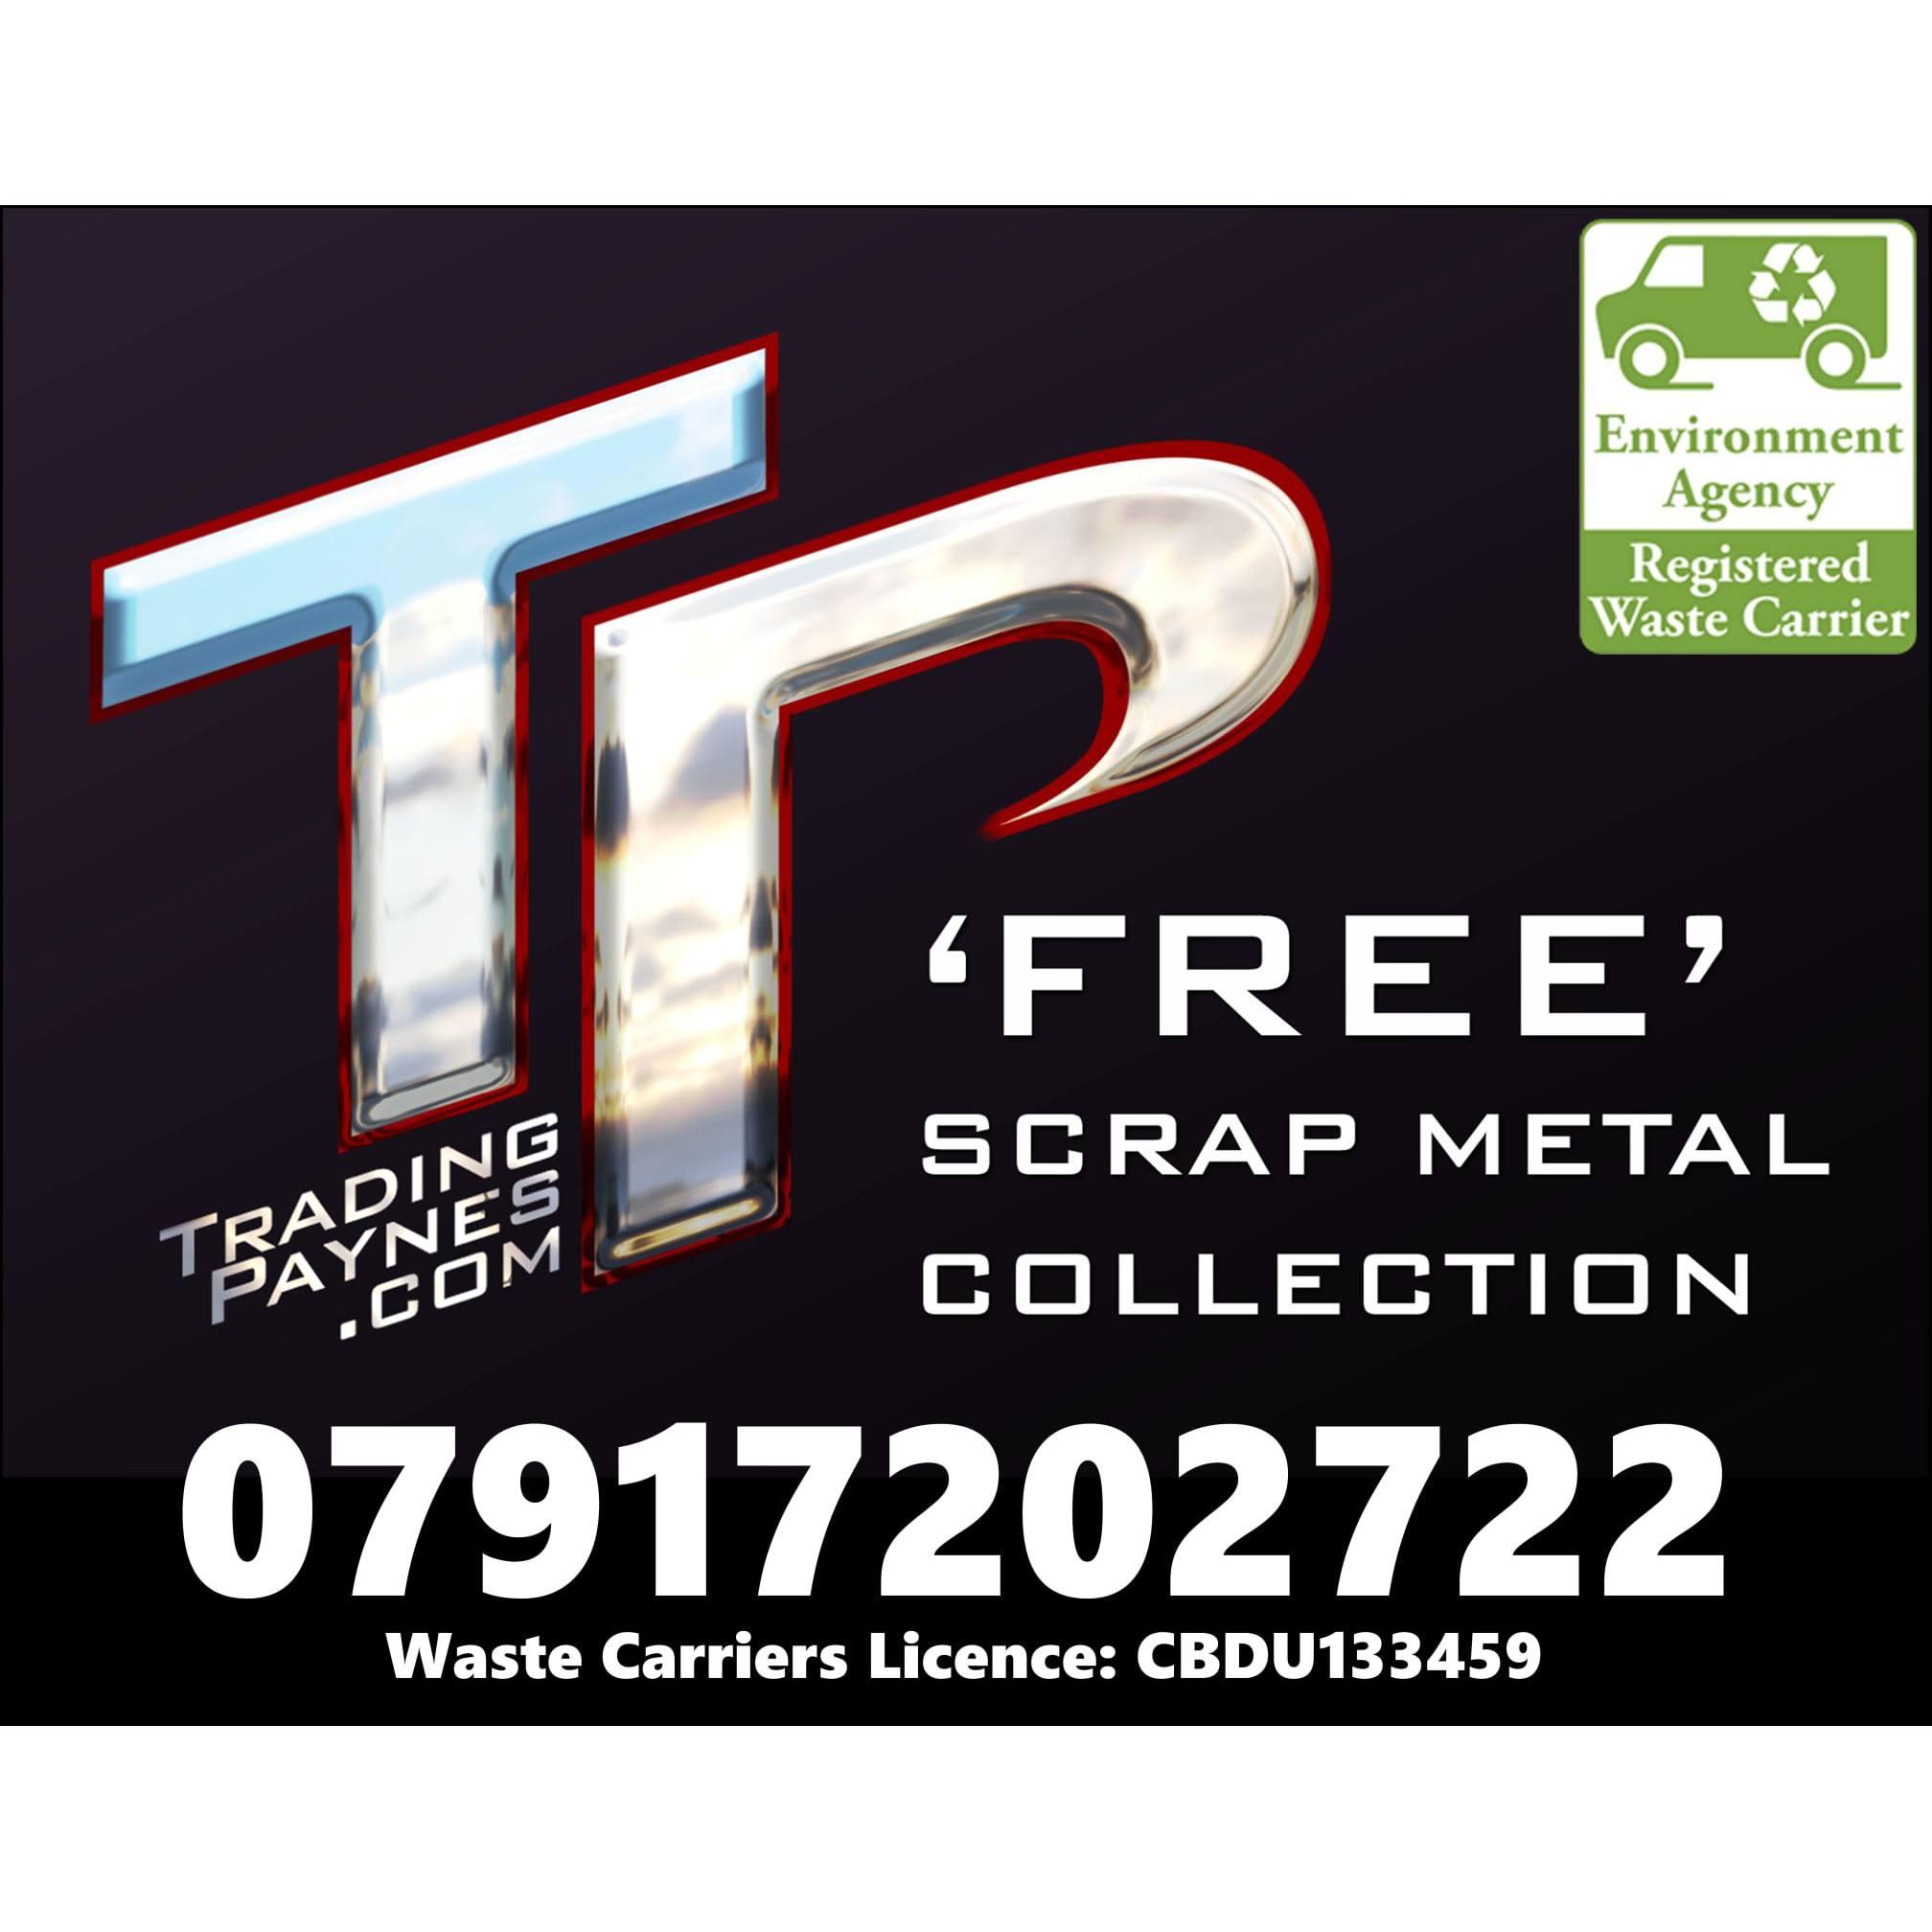 Trading Paynes Free Scrap Metal Collection - Ipswich, Essex IP2 9DJ - 07917 202722 | ShowMeLocal.com